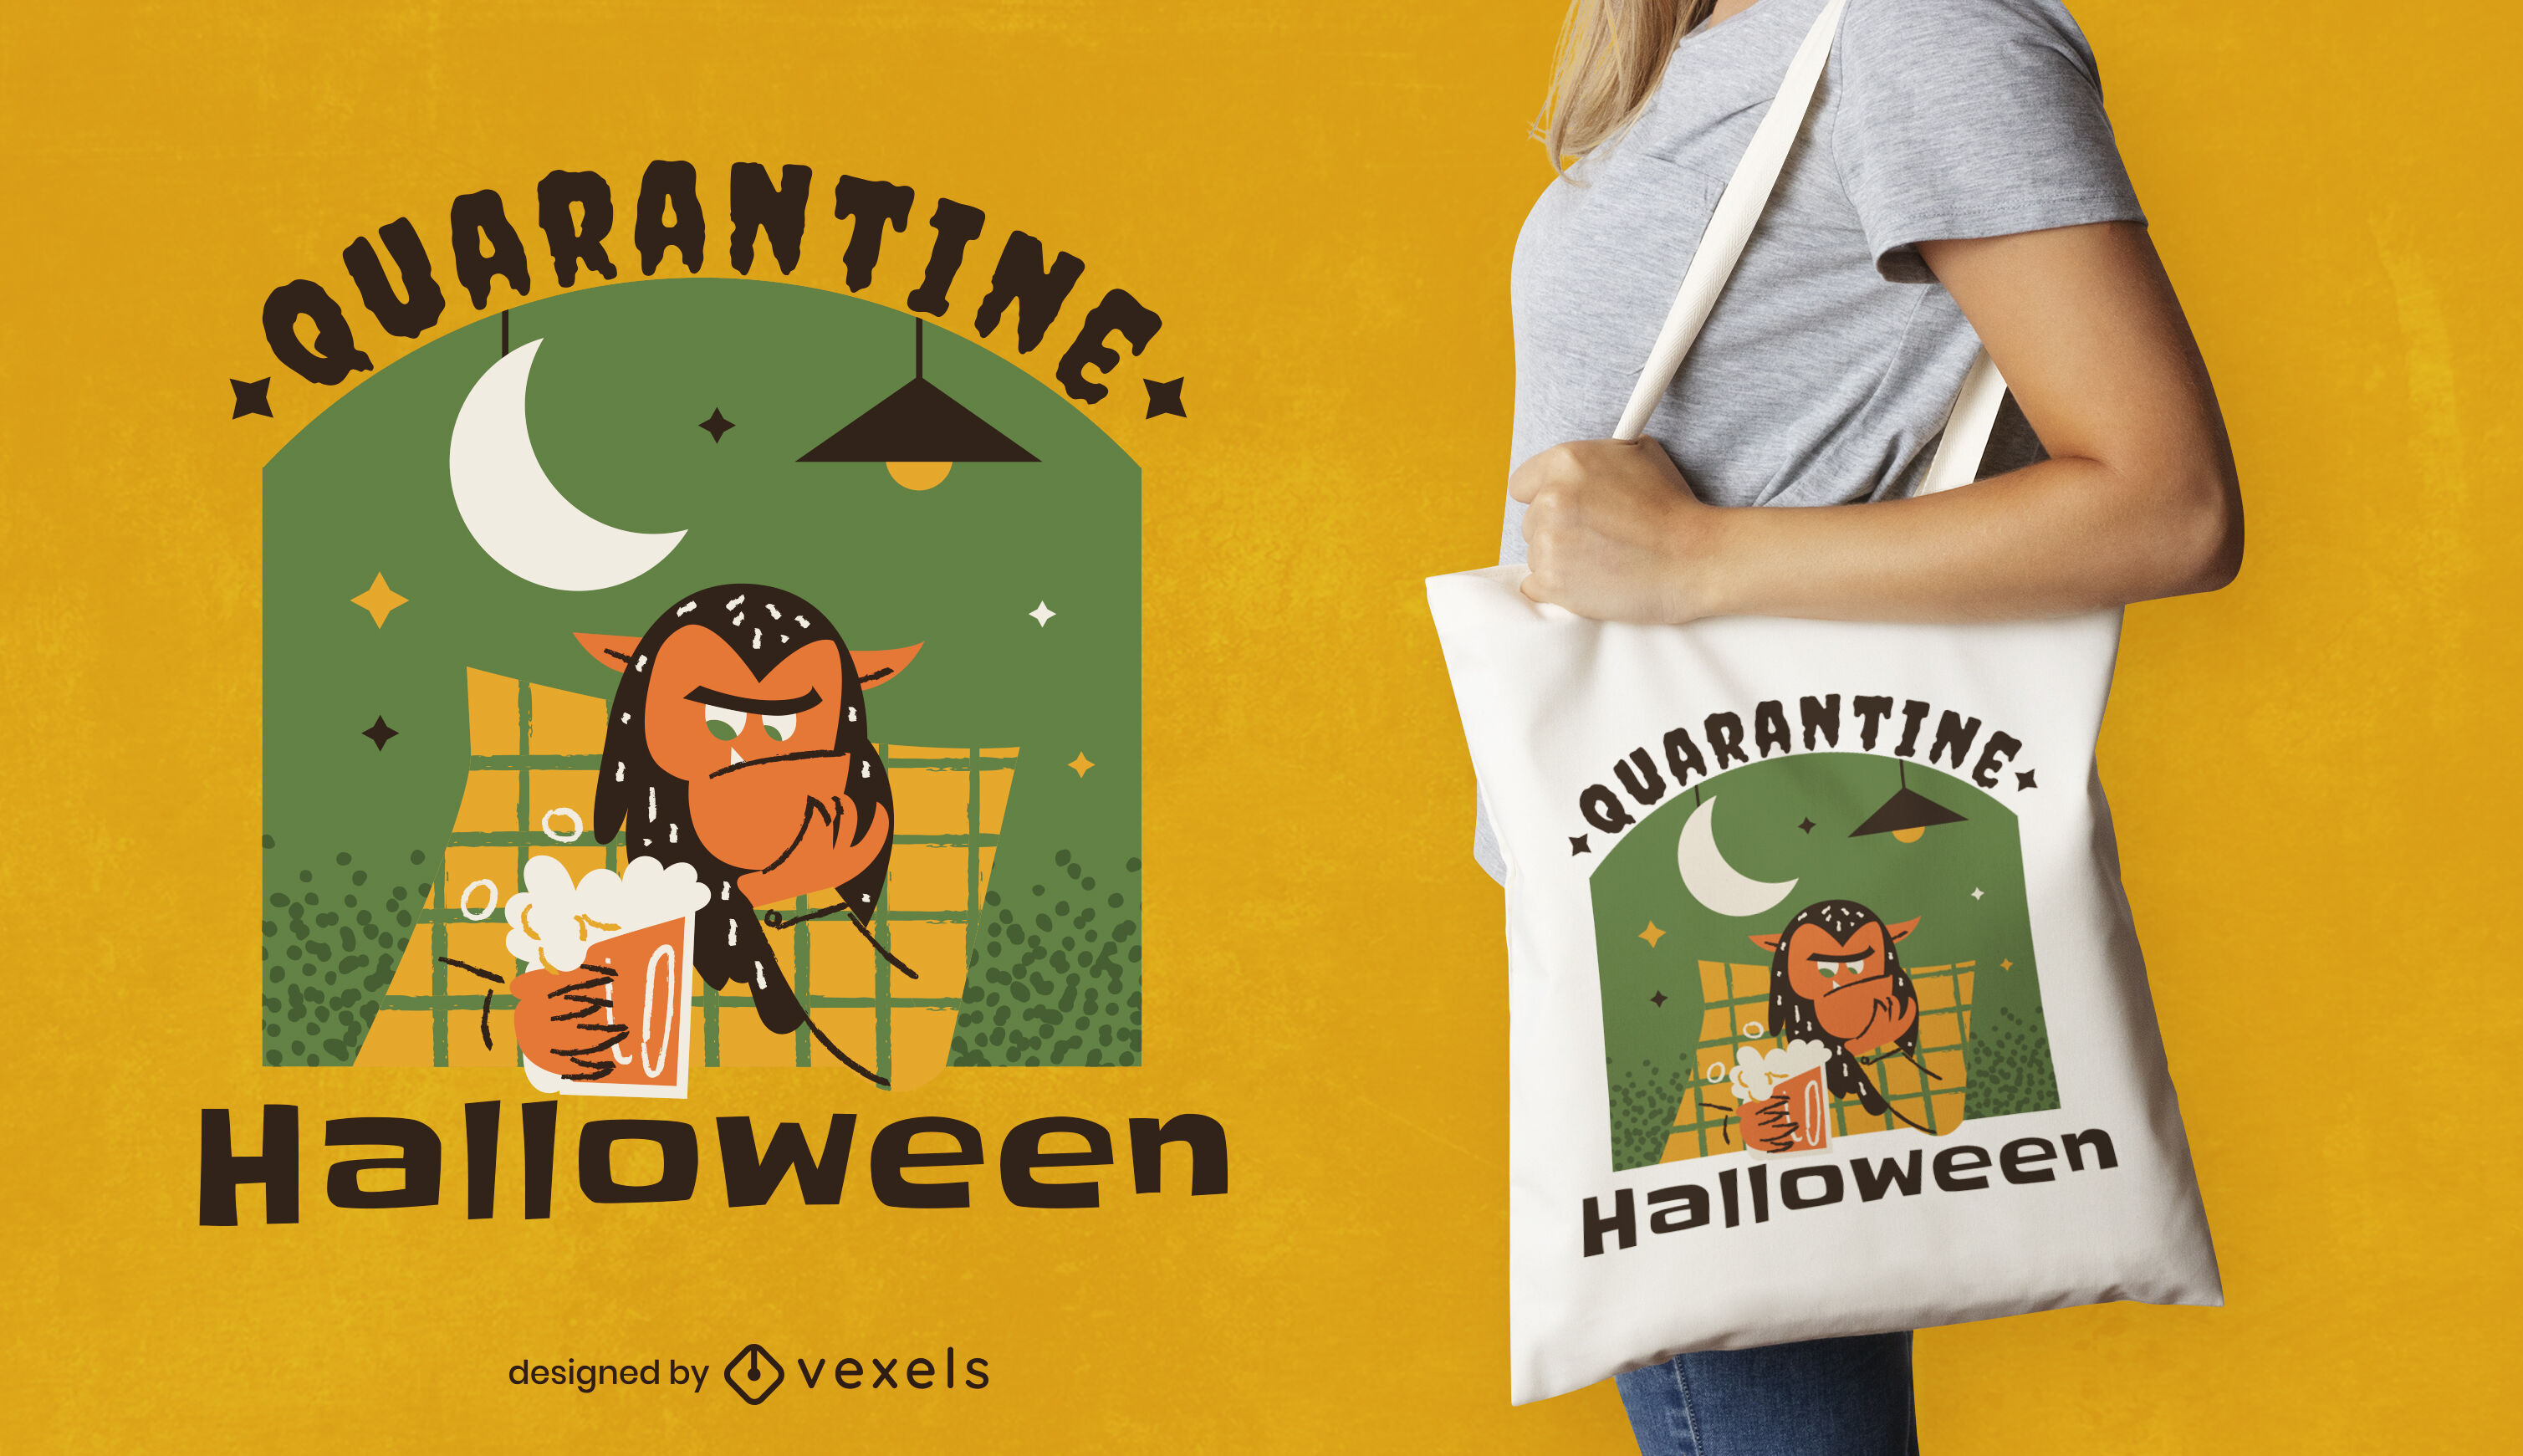 Quarantine monster halloween tote bag